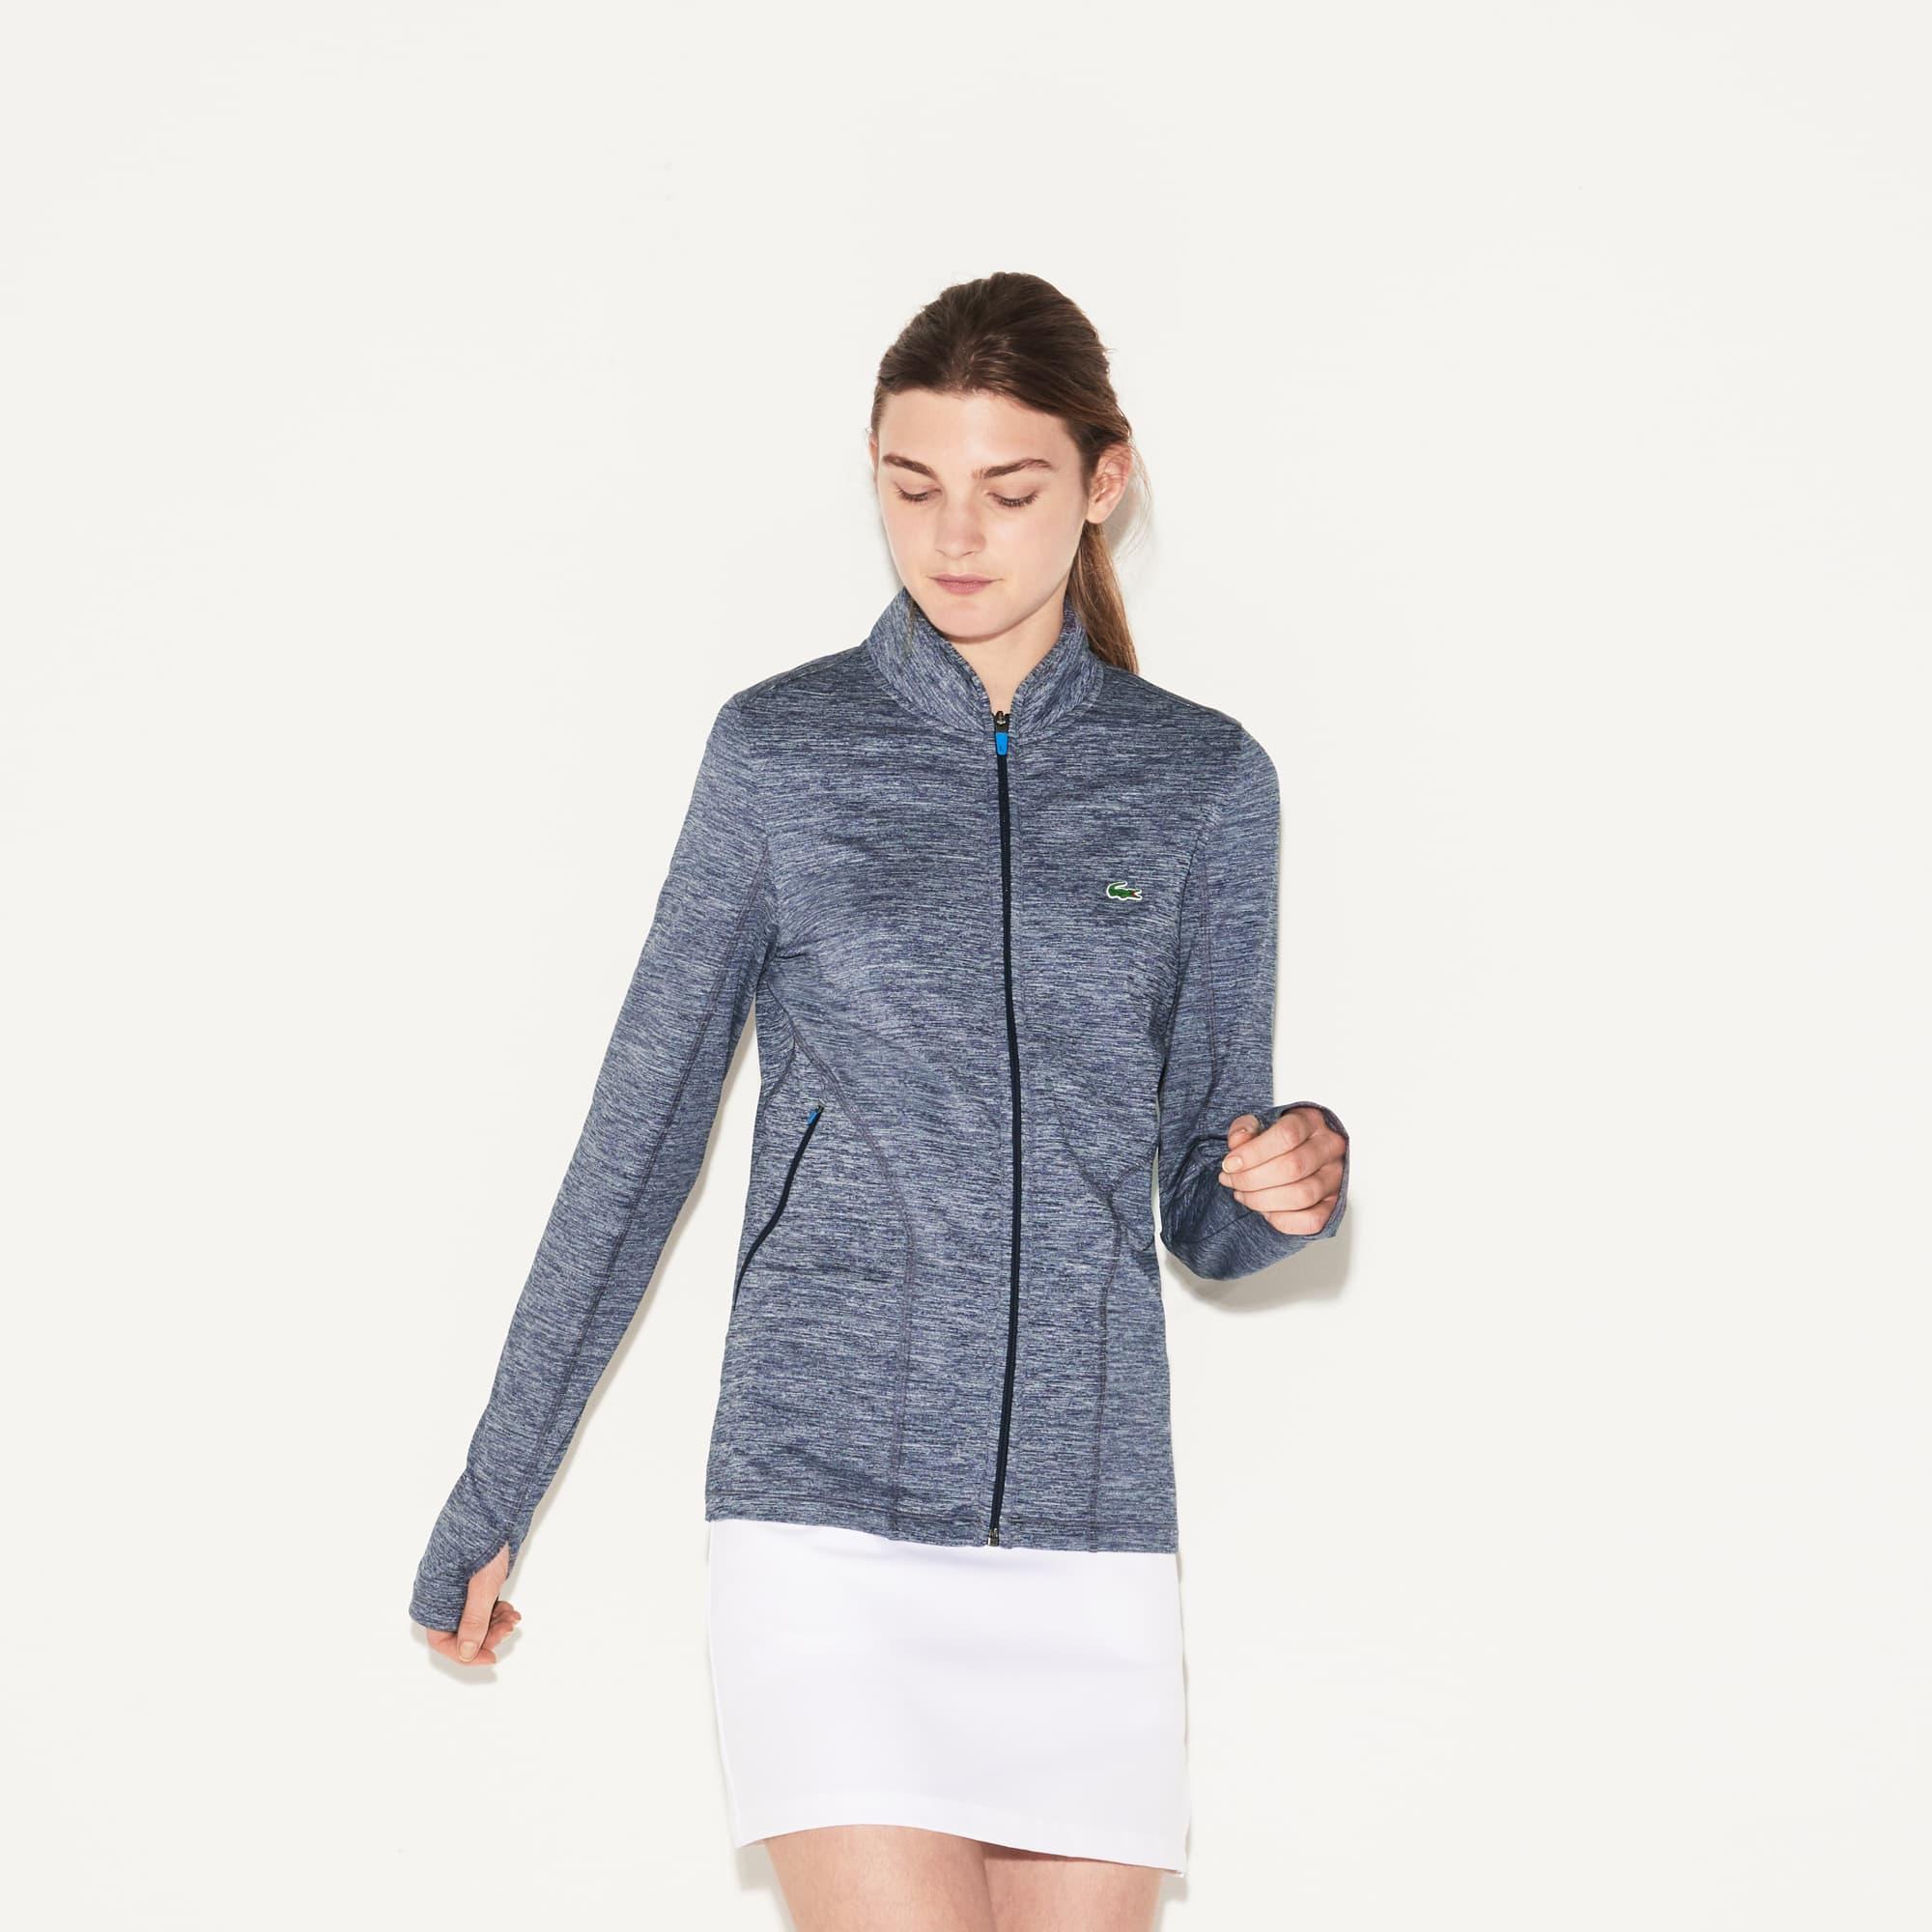 Sweatshirt técnica com fecho Lacoste SPORT para Senhora